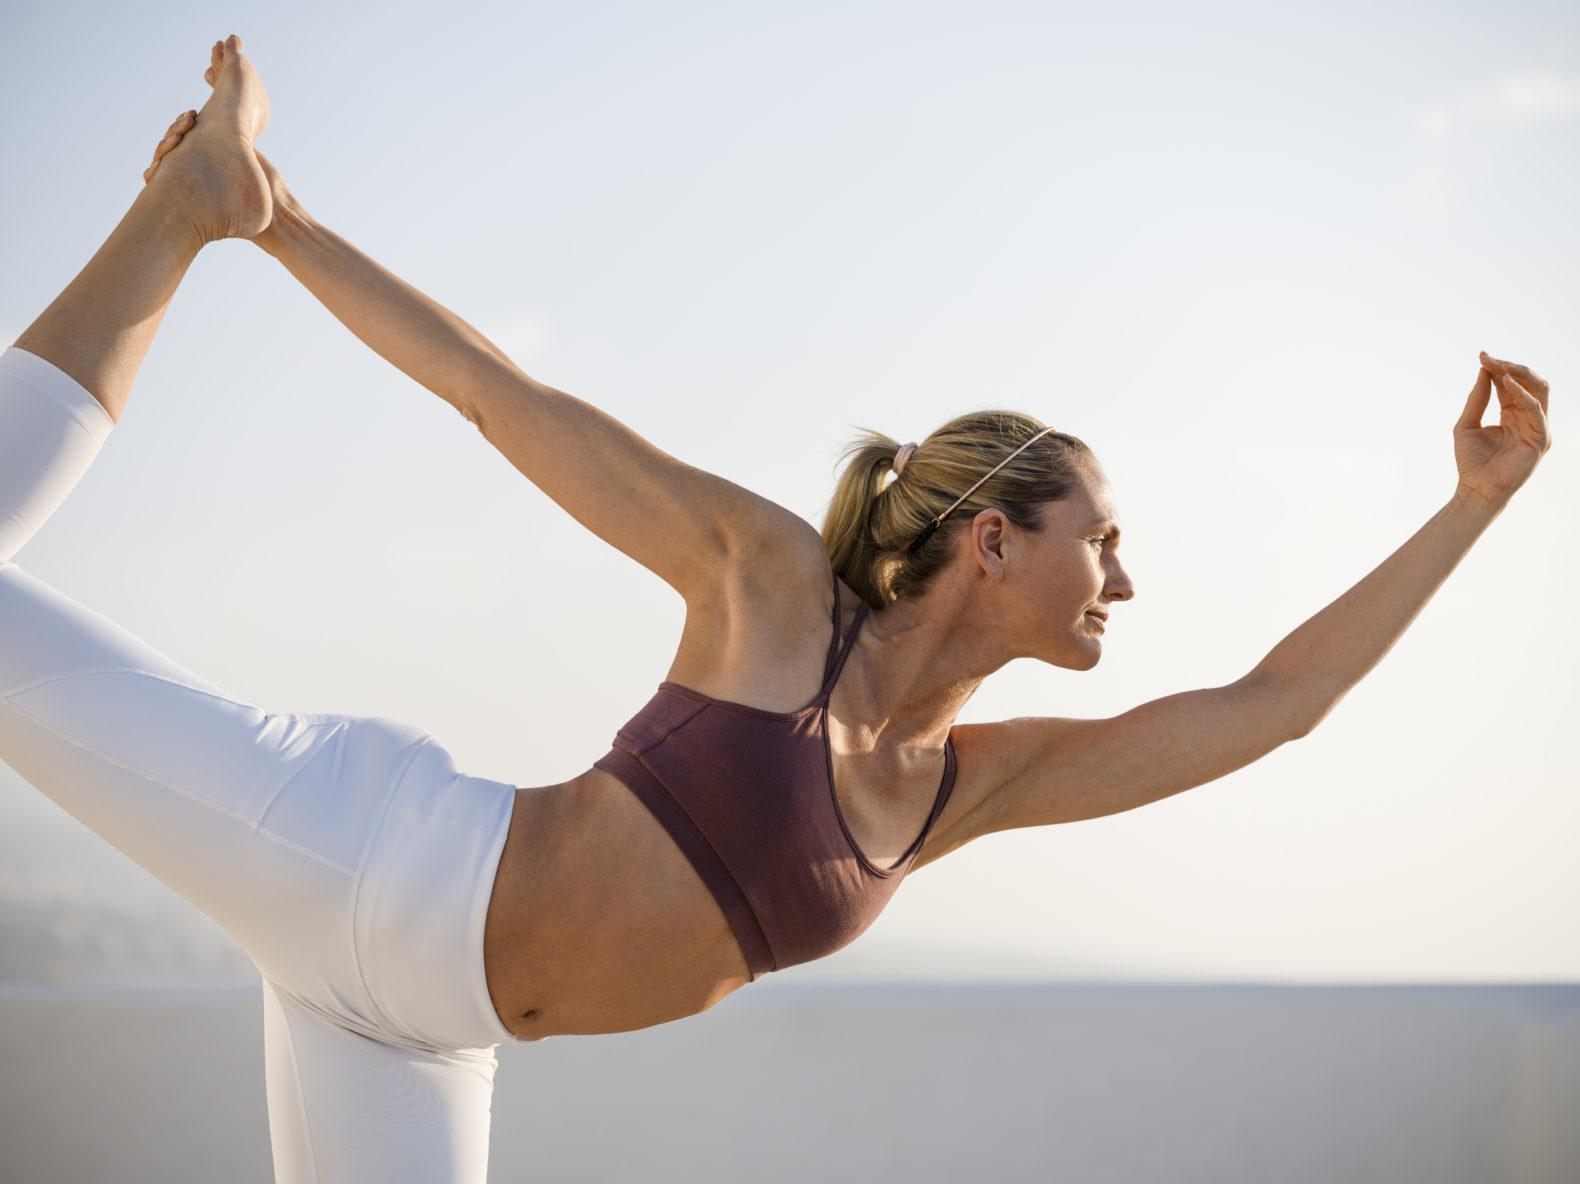 woman-doing-yoga-rooftop-ocean-air-meditation-oceano-hotel-health-spa-tenerife-spain